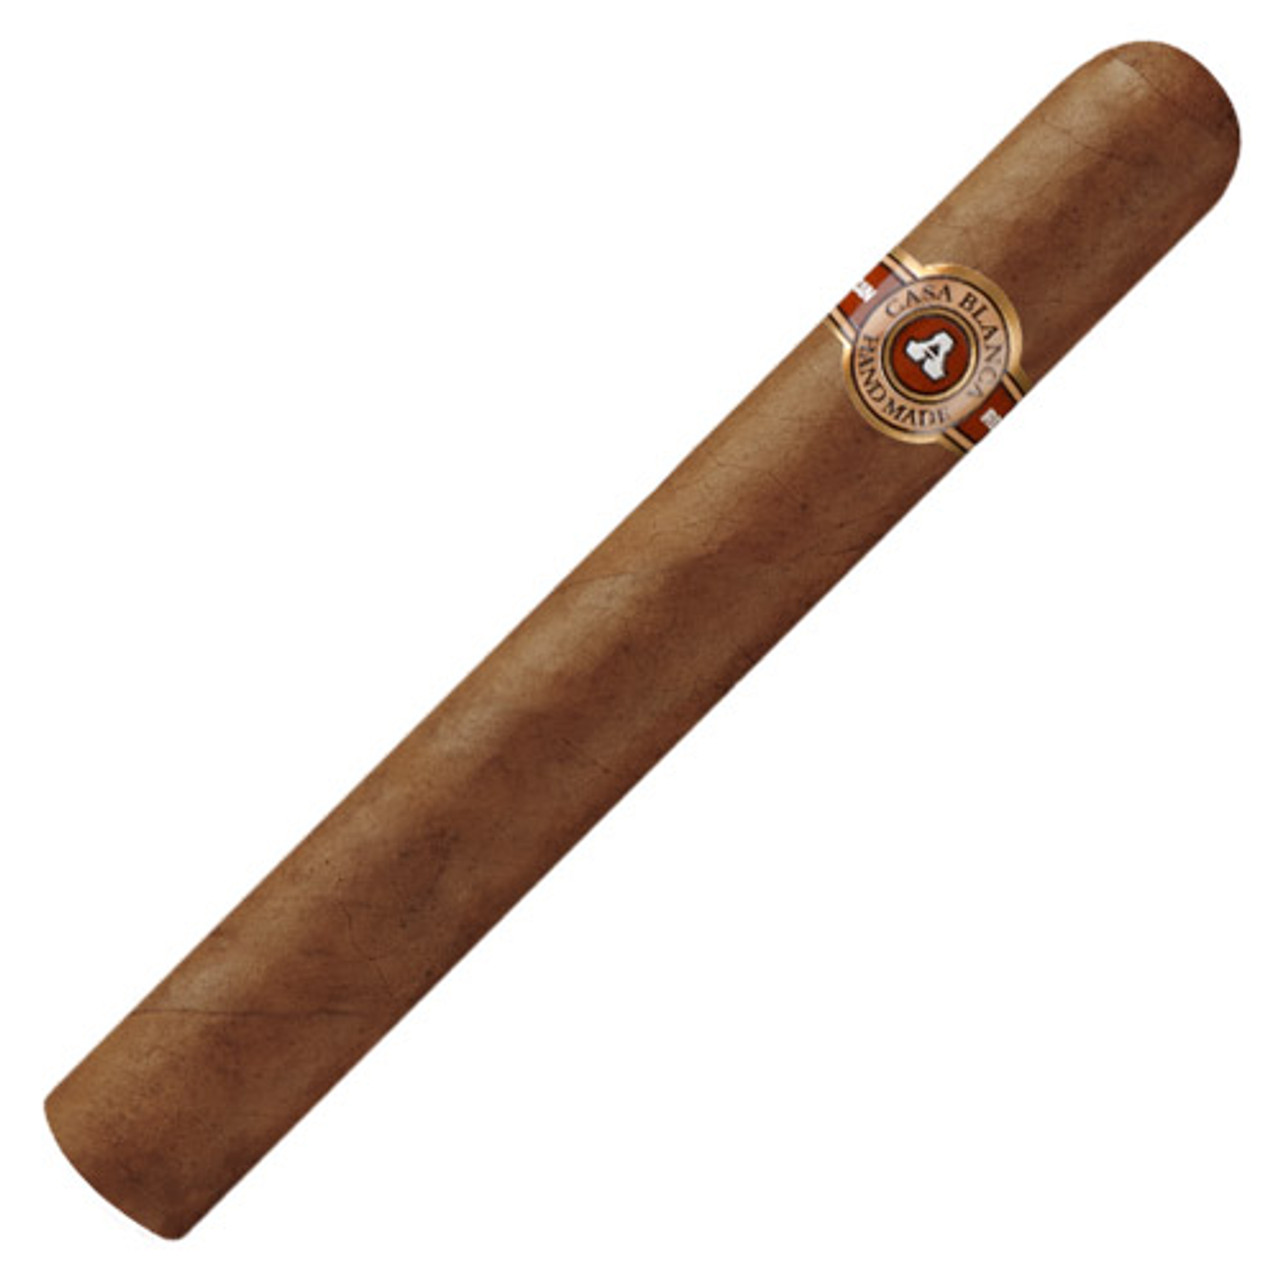 Casa Blanca Magnum Maduro Cigars - 7 x 60 (Pack of 5)